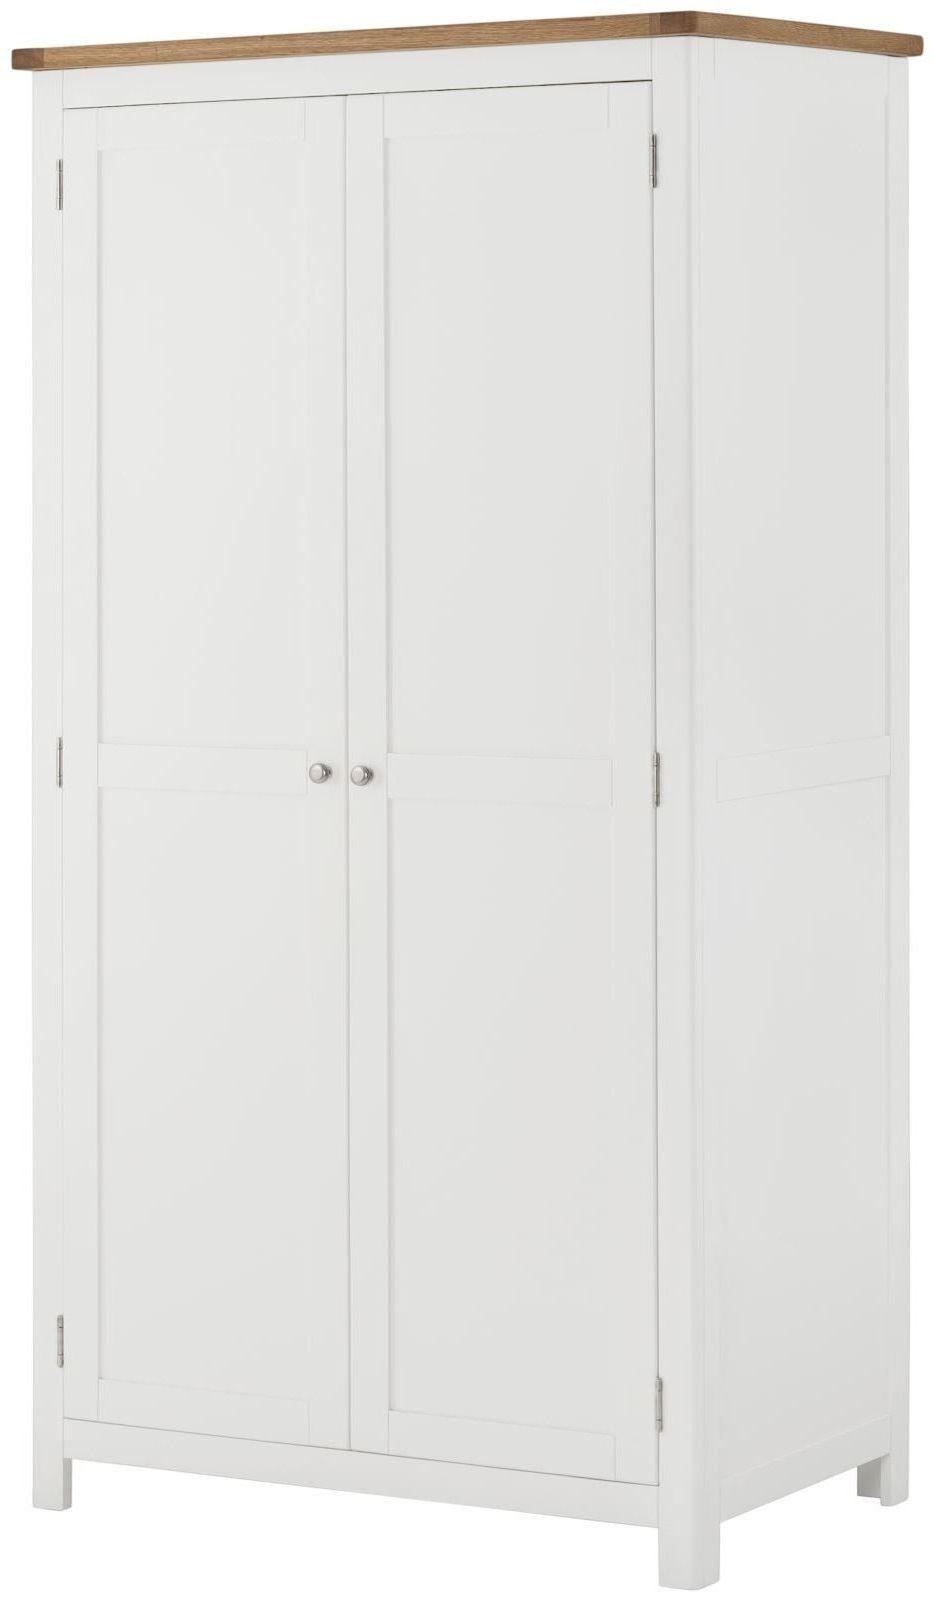 Stratton White Wardrobe 2 Doors